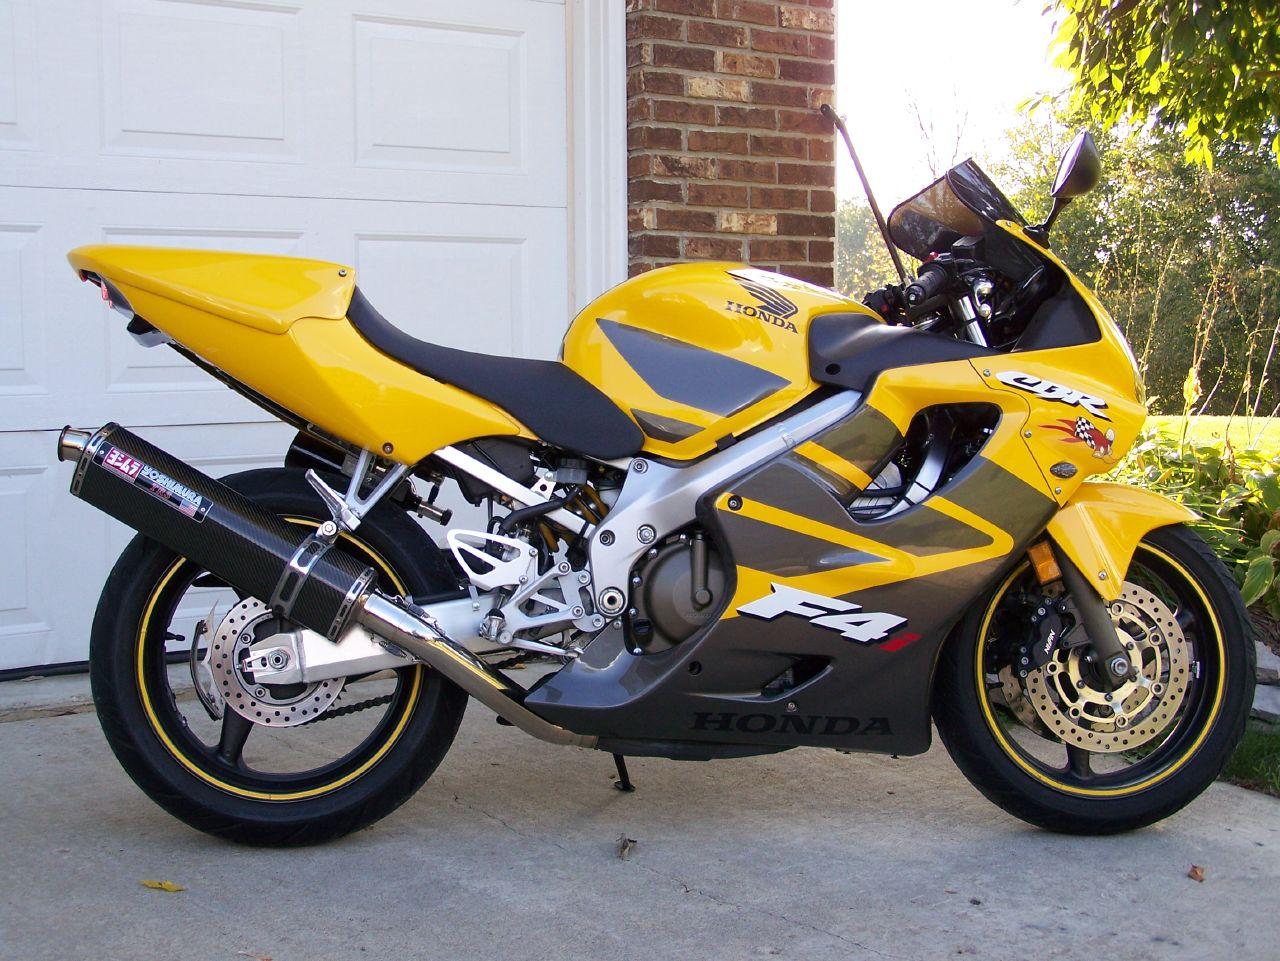 Pics of my bike 1492216522_269e2b2751_o